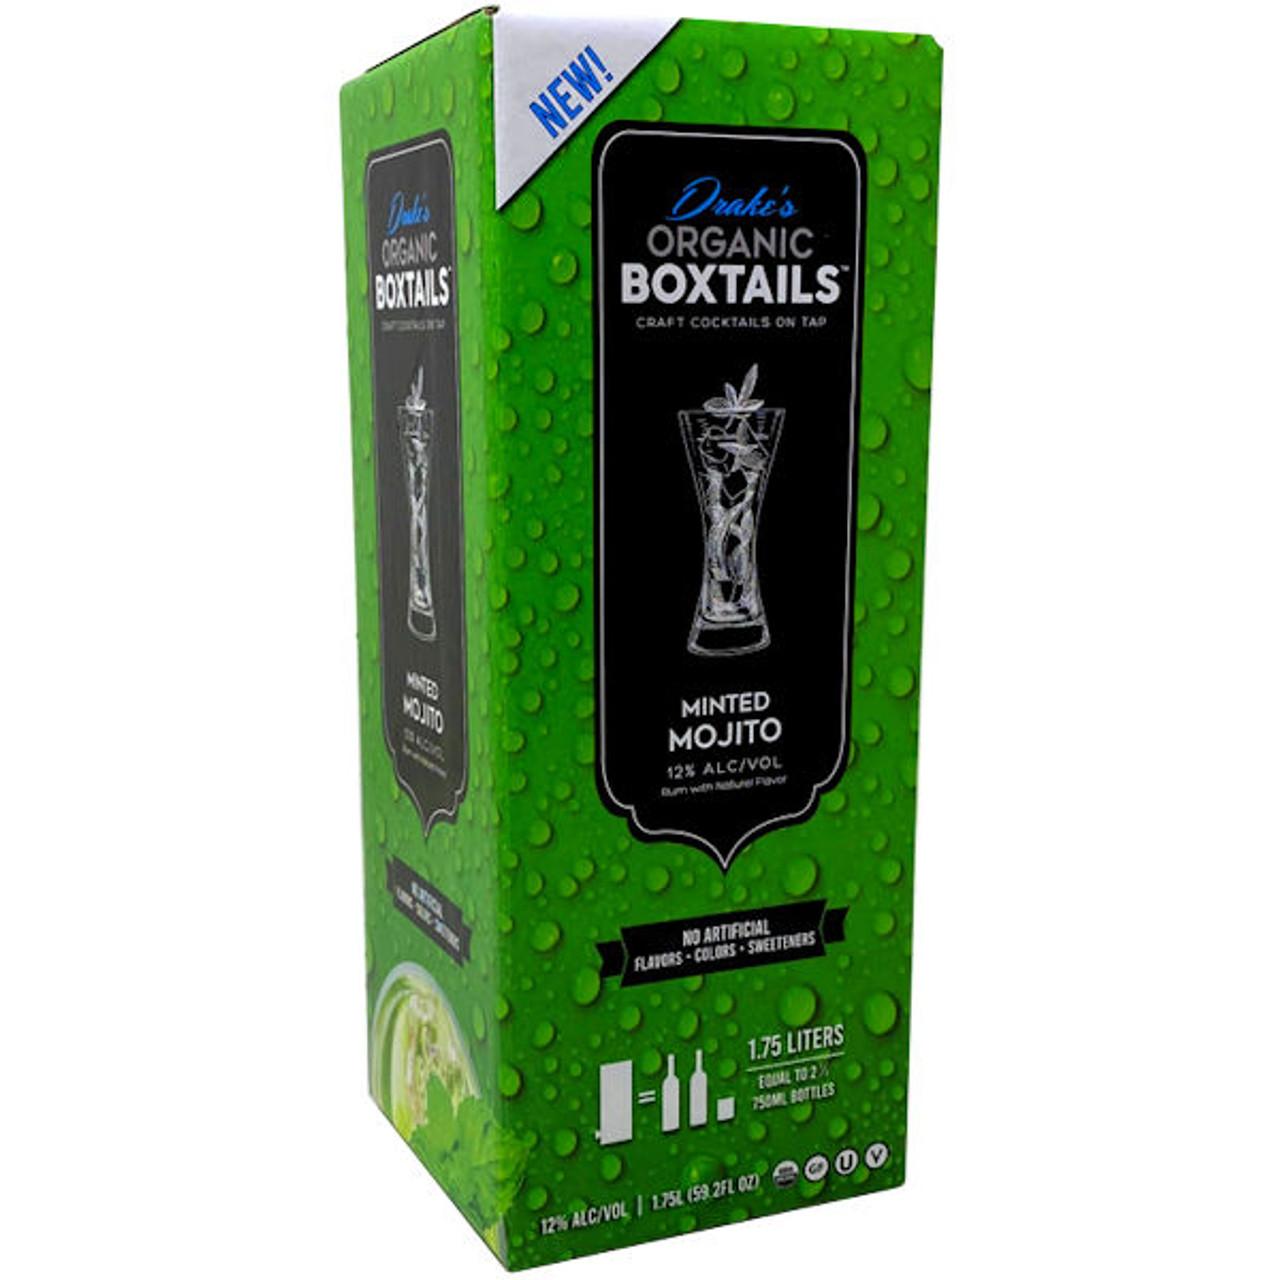 Drake's Organic Boxtails Mint Mojito 1.75L